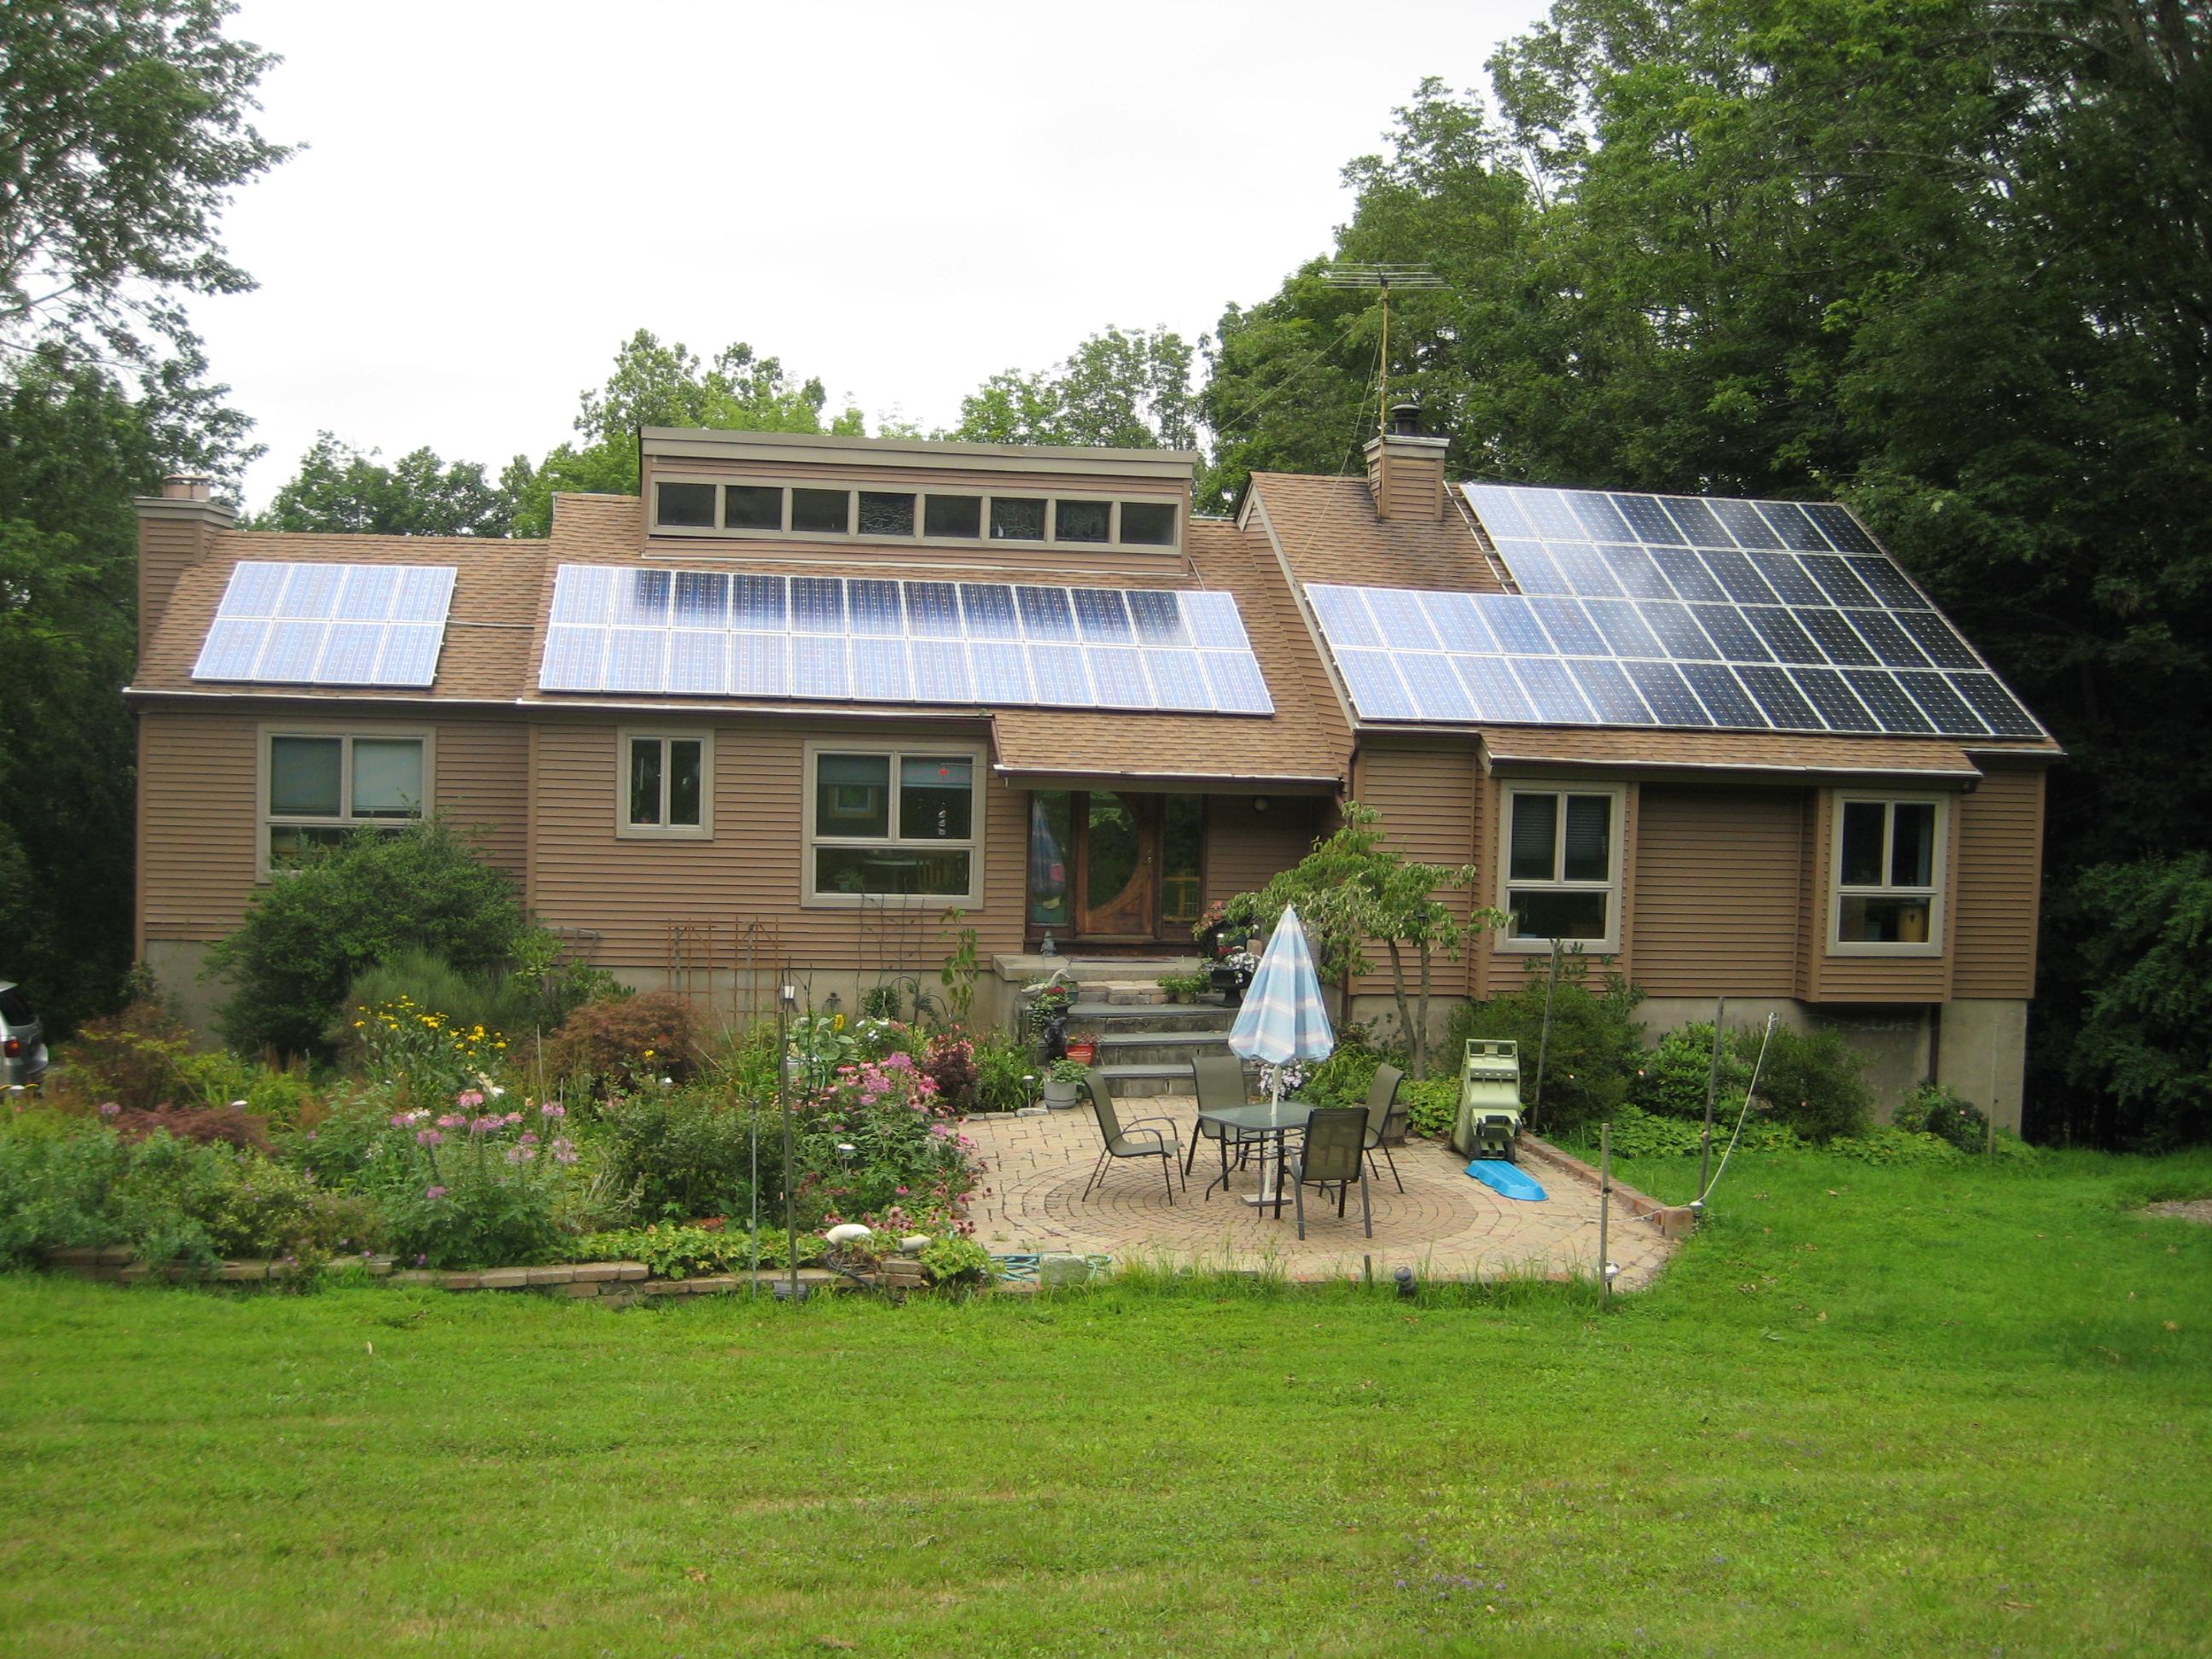 Homes With Solar Panels Fin San Antonio Tx